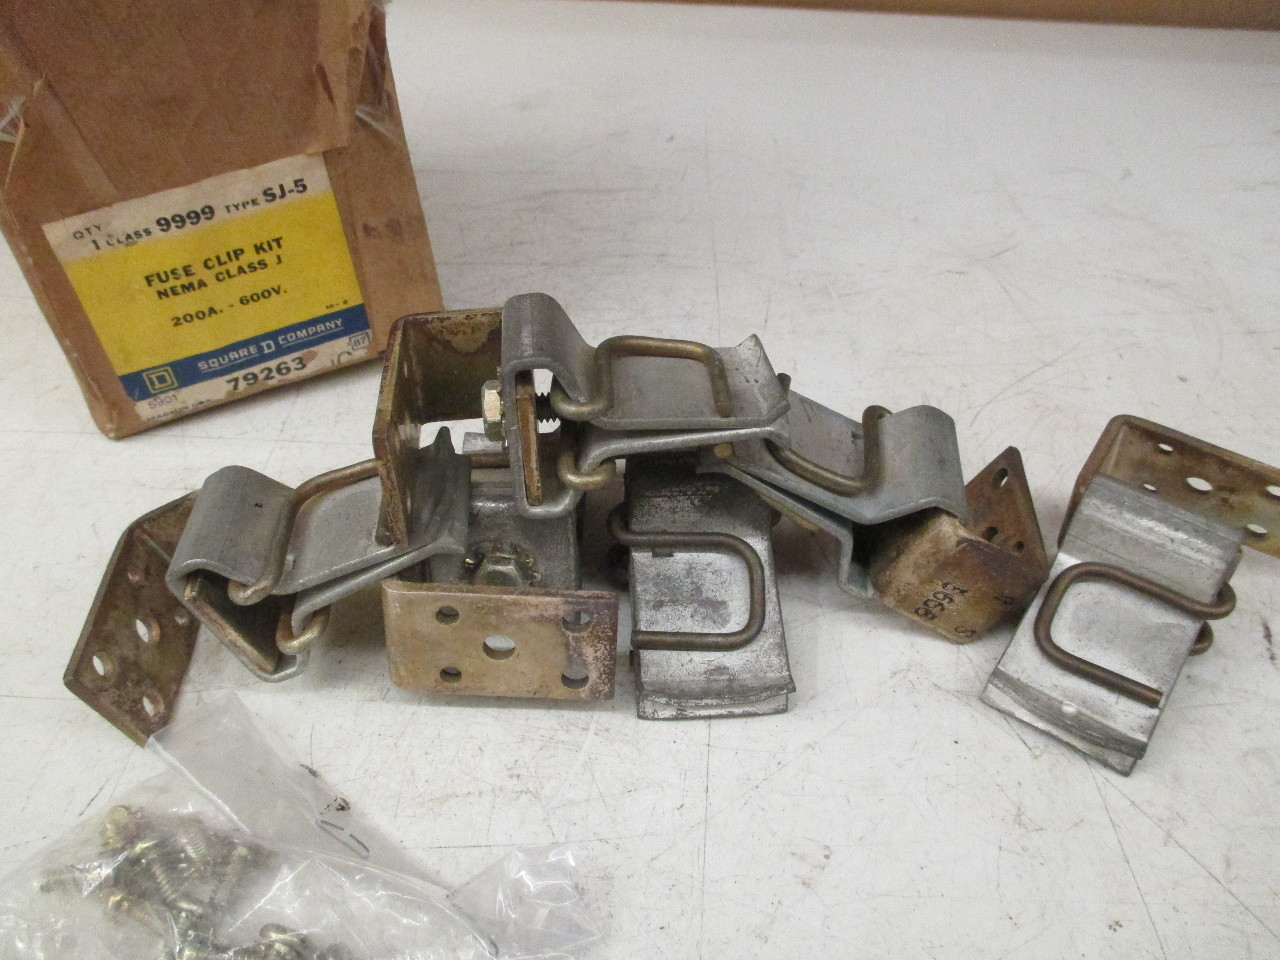 square d fuse boxes square d 79263 class 9999 type sj-5 fuse clip kit 200a ... #8